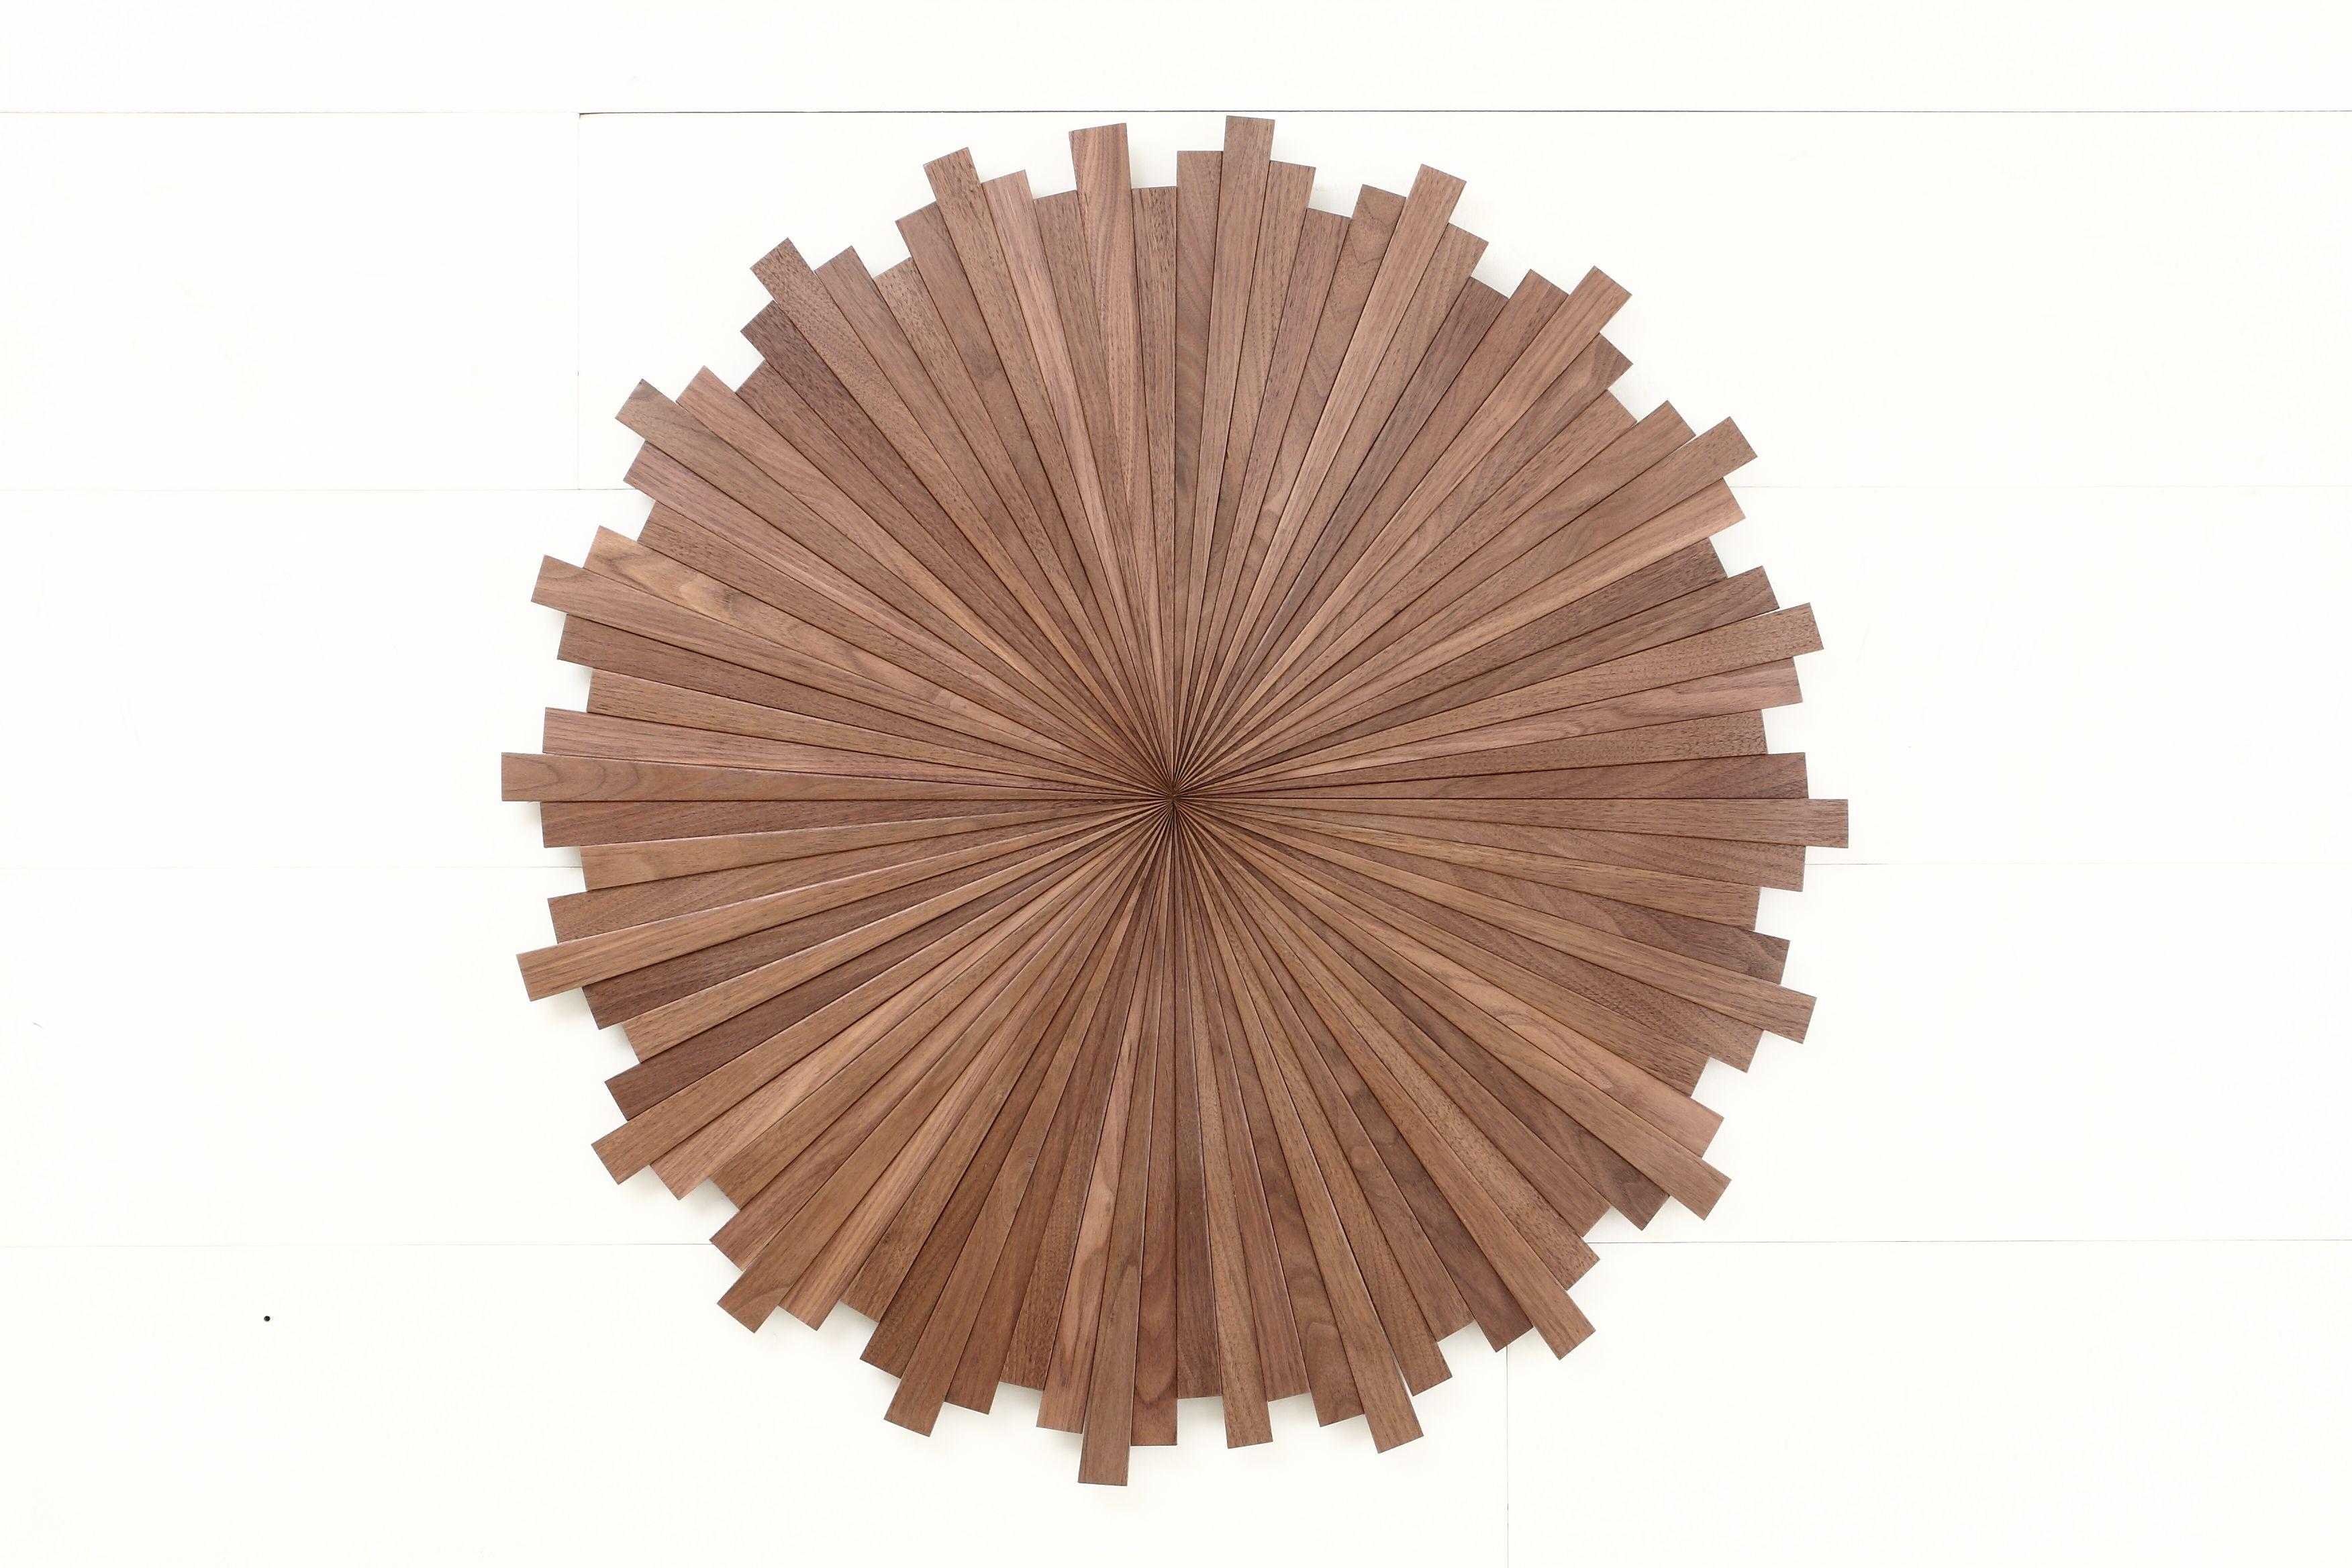 Custom Made Starburst Wood Wall Art Of Black Walnut Diffe Sizes Available